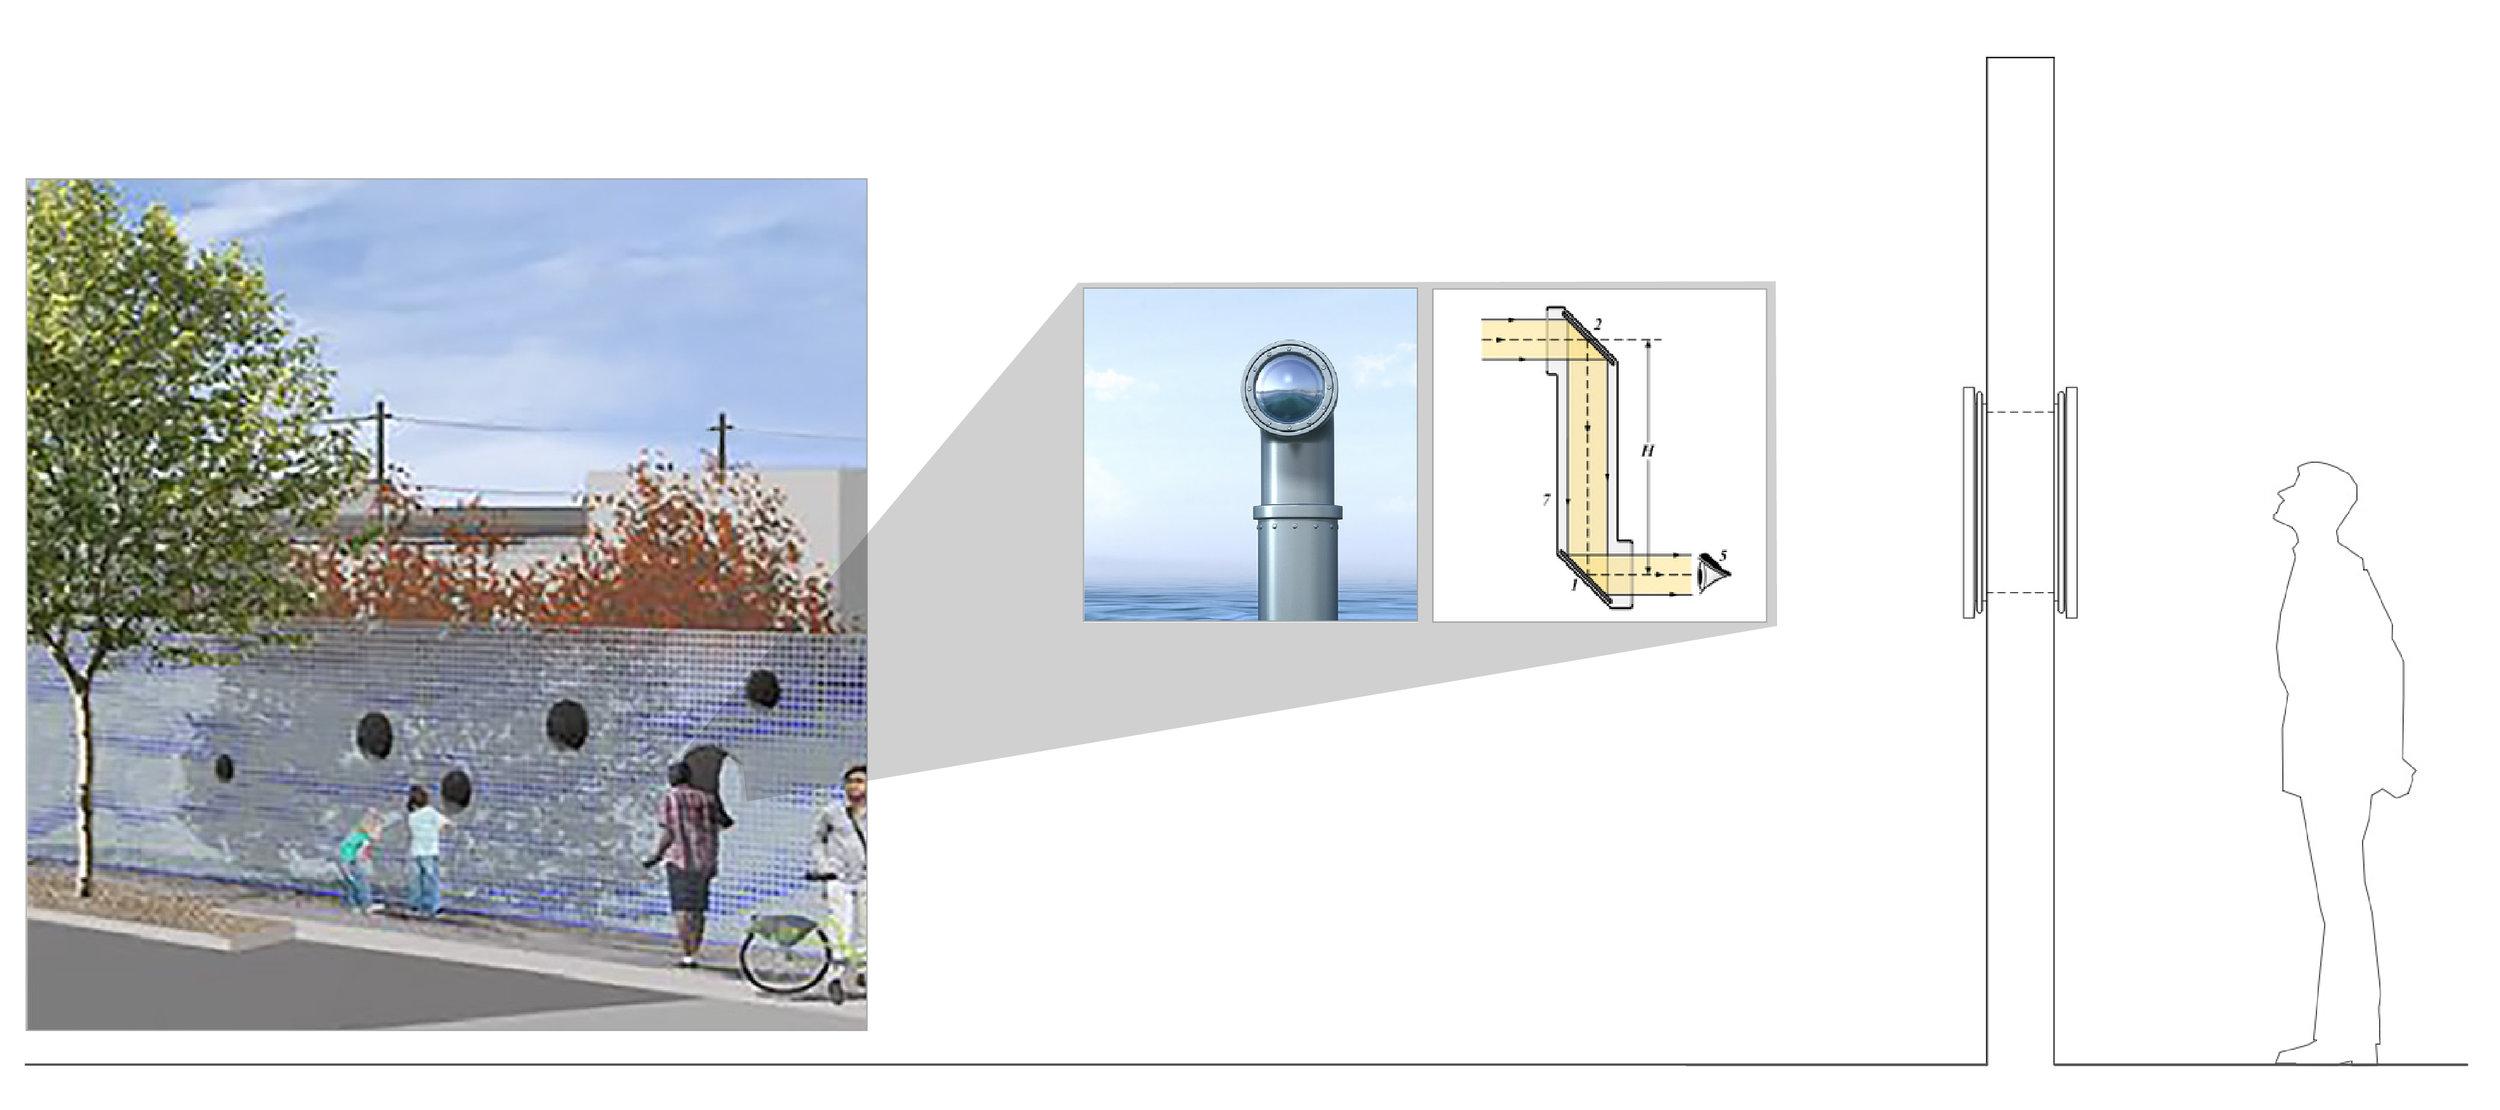 InkeDesign_AECOM_portholes-9-02.jpg